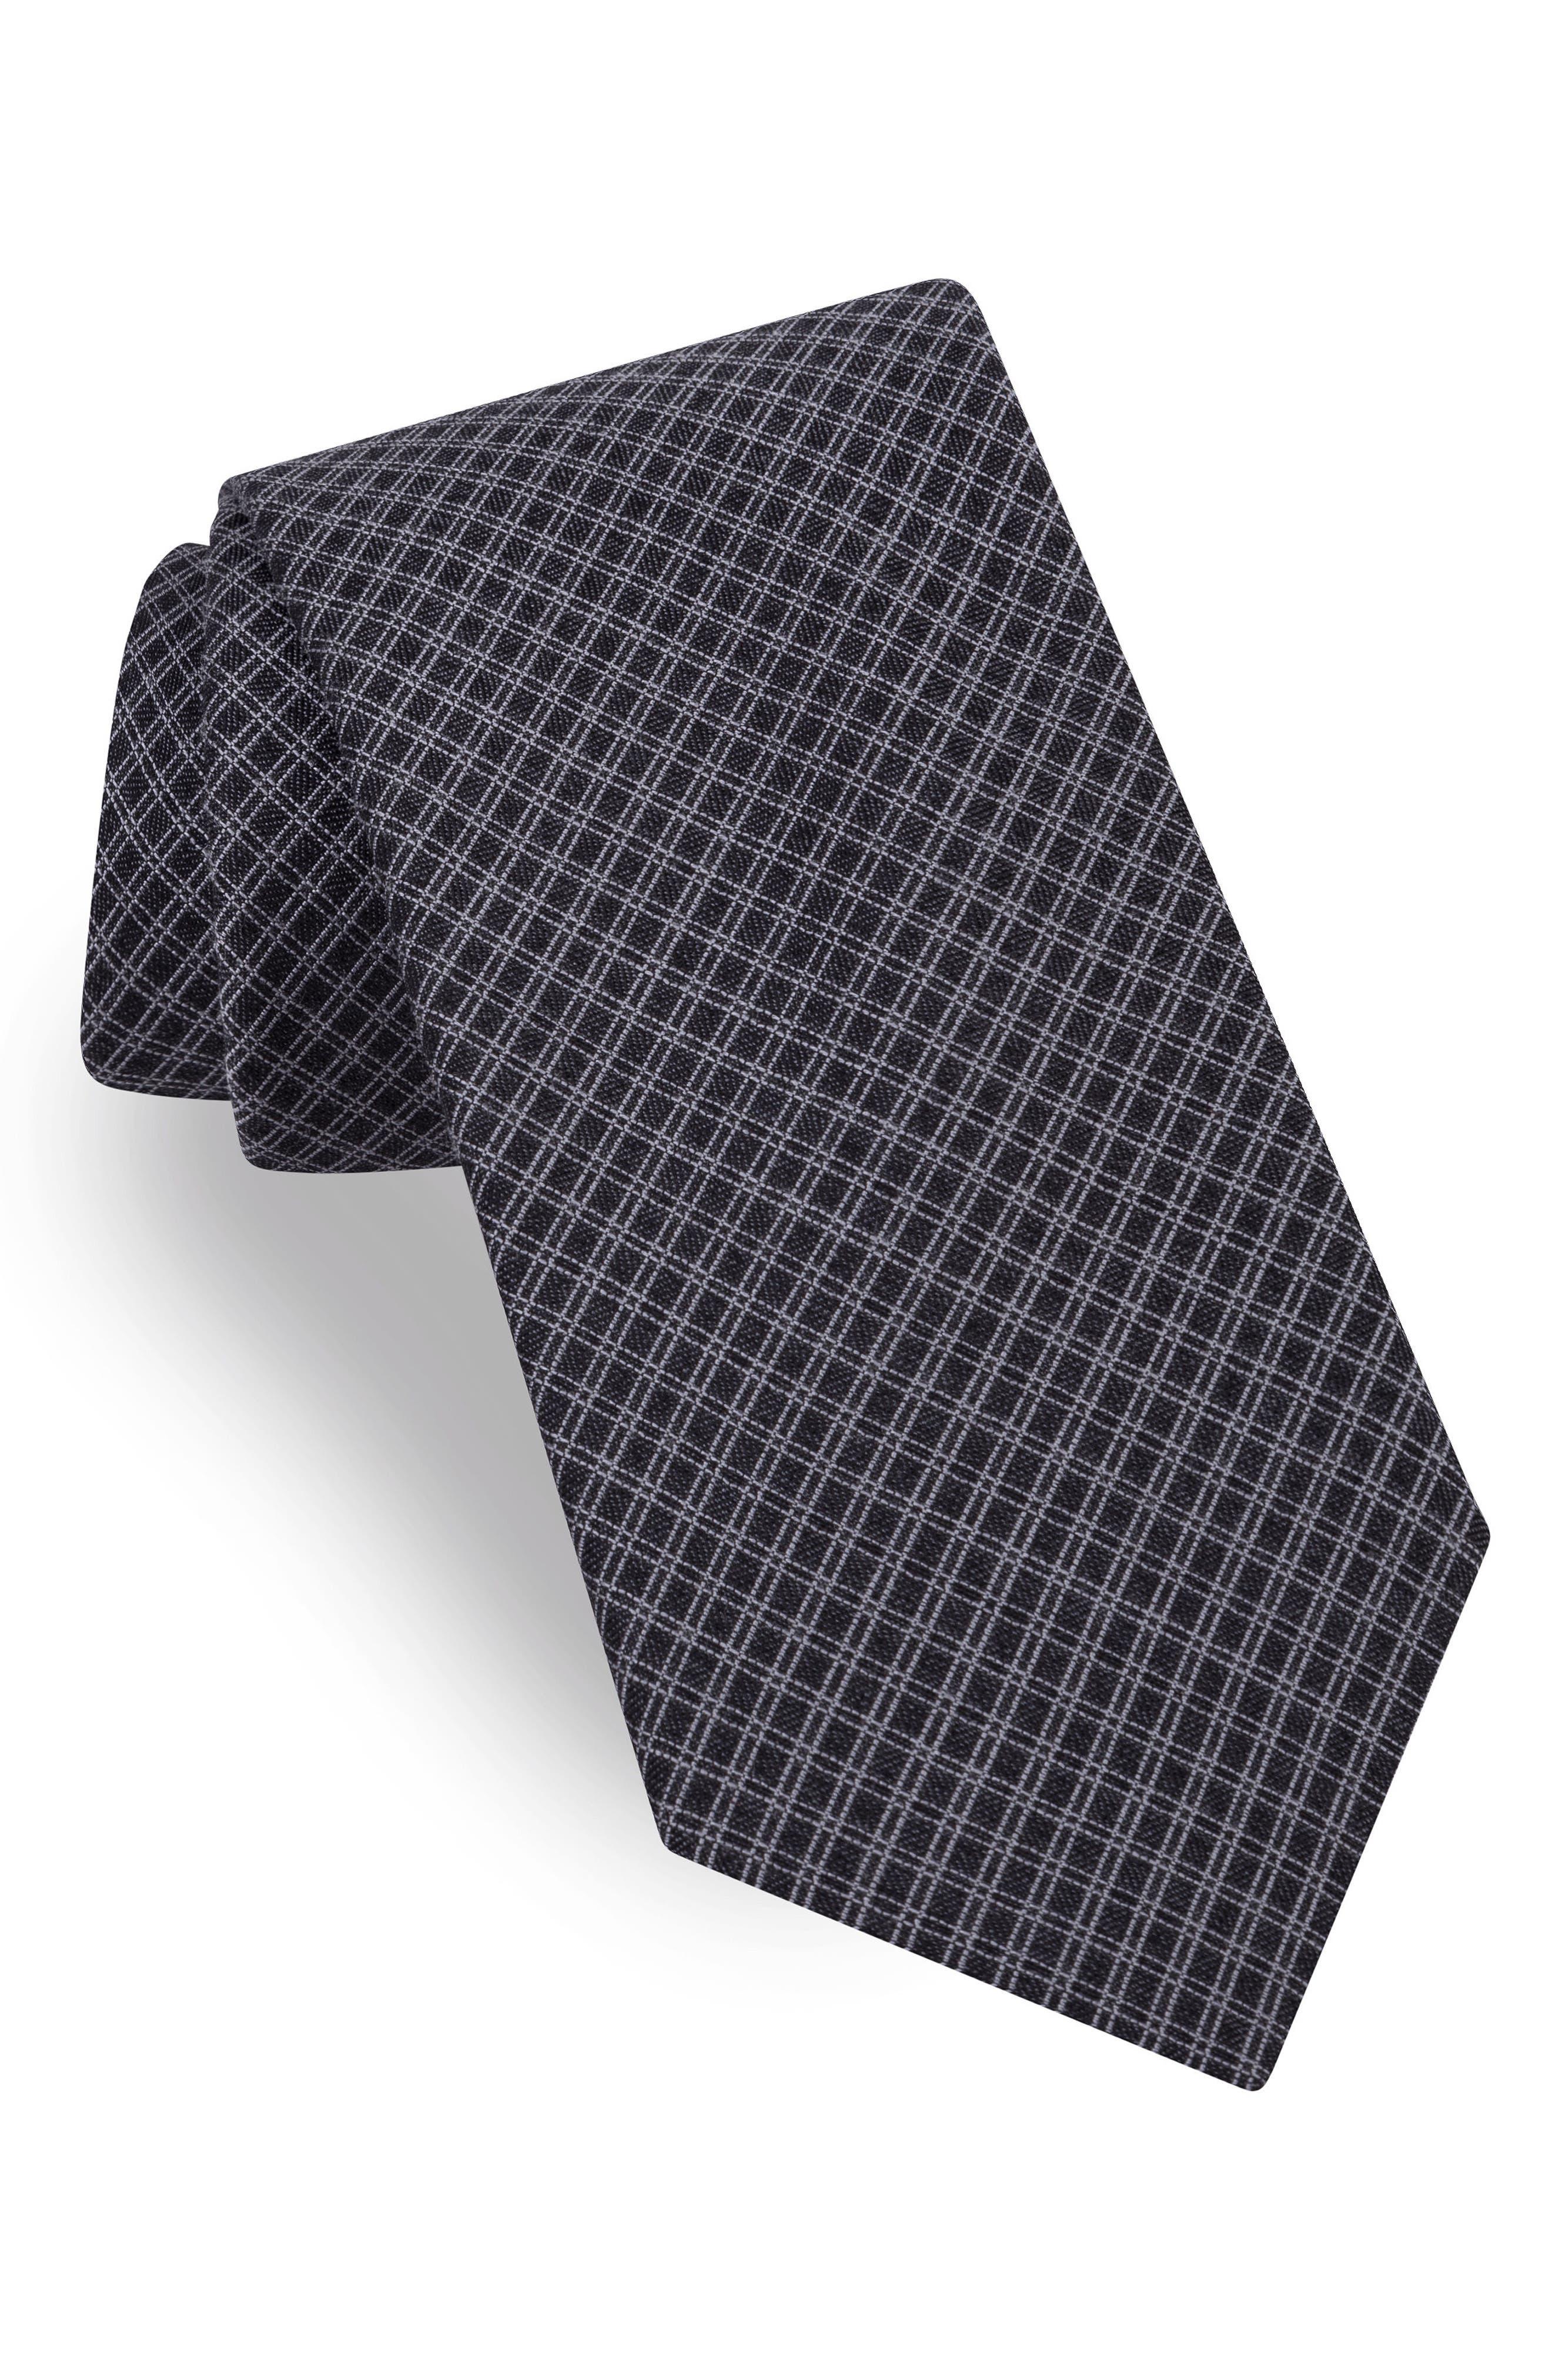 West End Wardrobe Silk Tie,                             Main thumbnail 2, color,